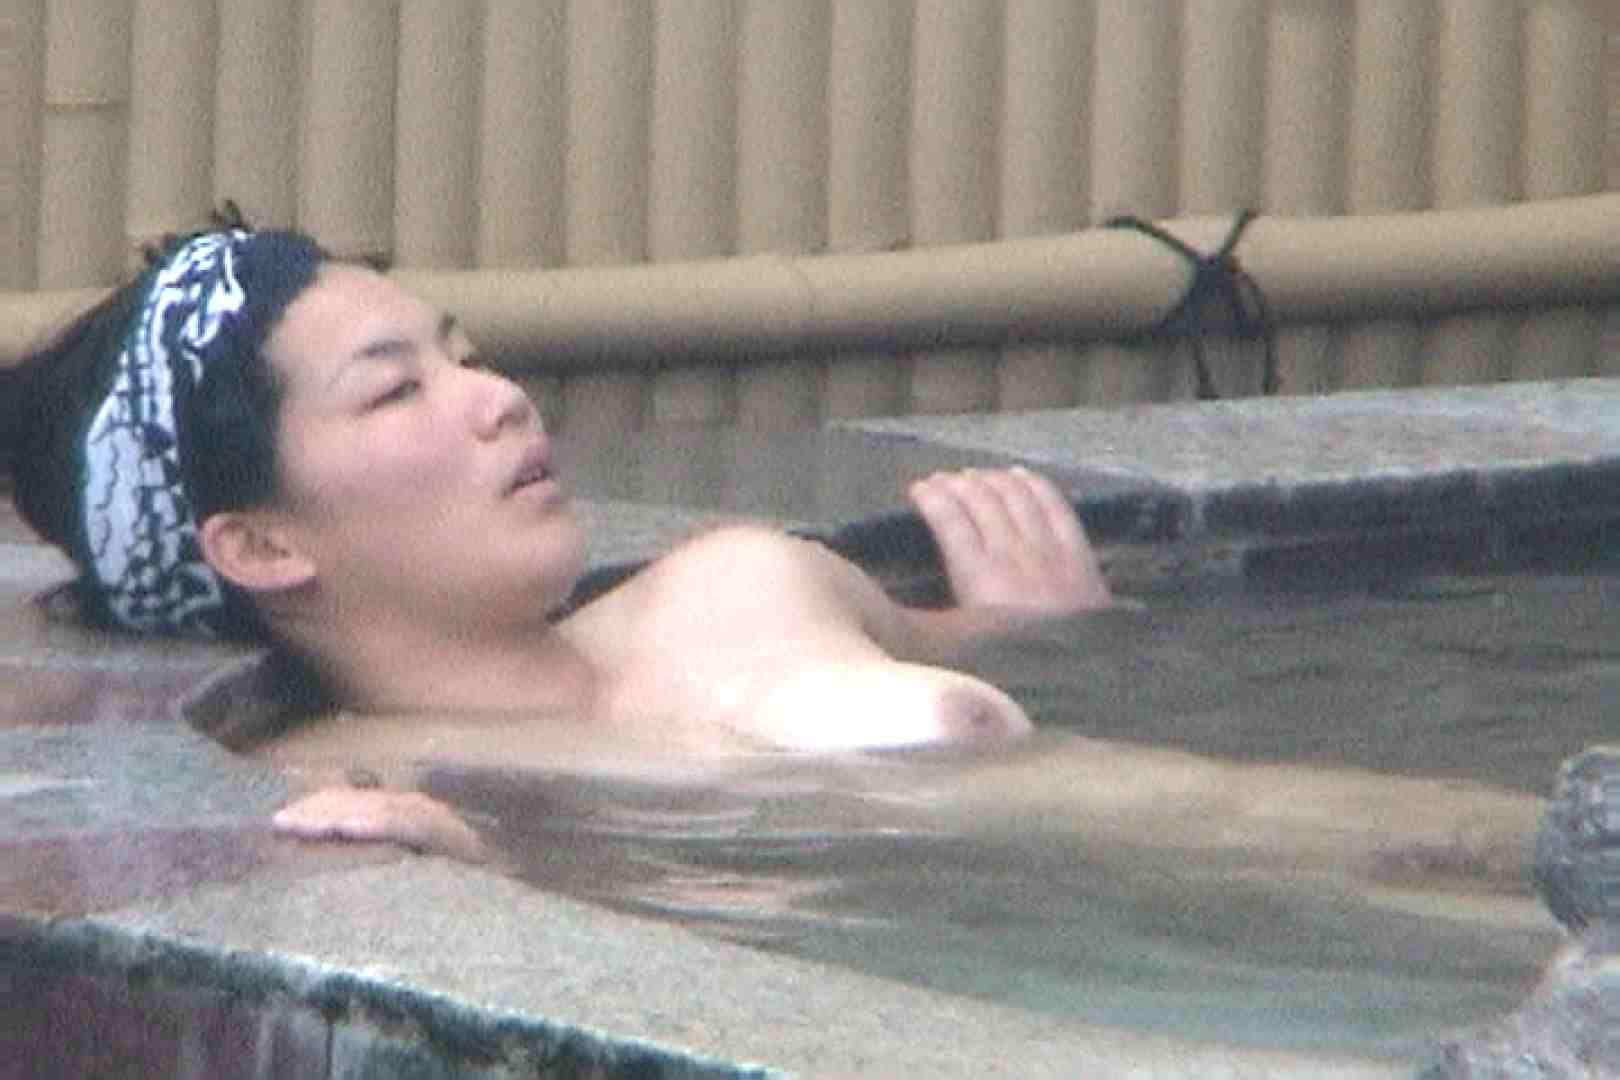 Aquaな露天風呂Vol.103 盗撮シリーズ | 露天風呂編  94PIX 33